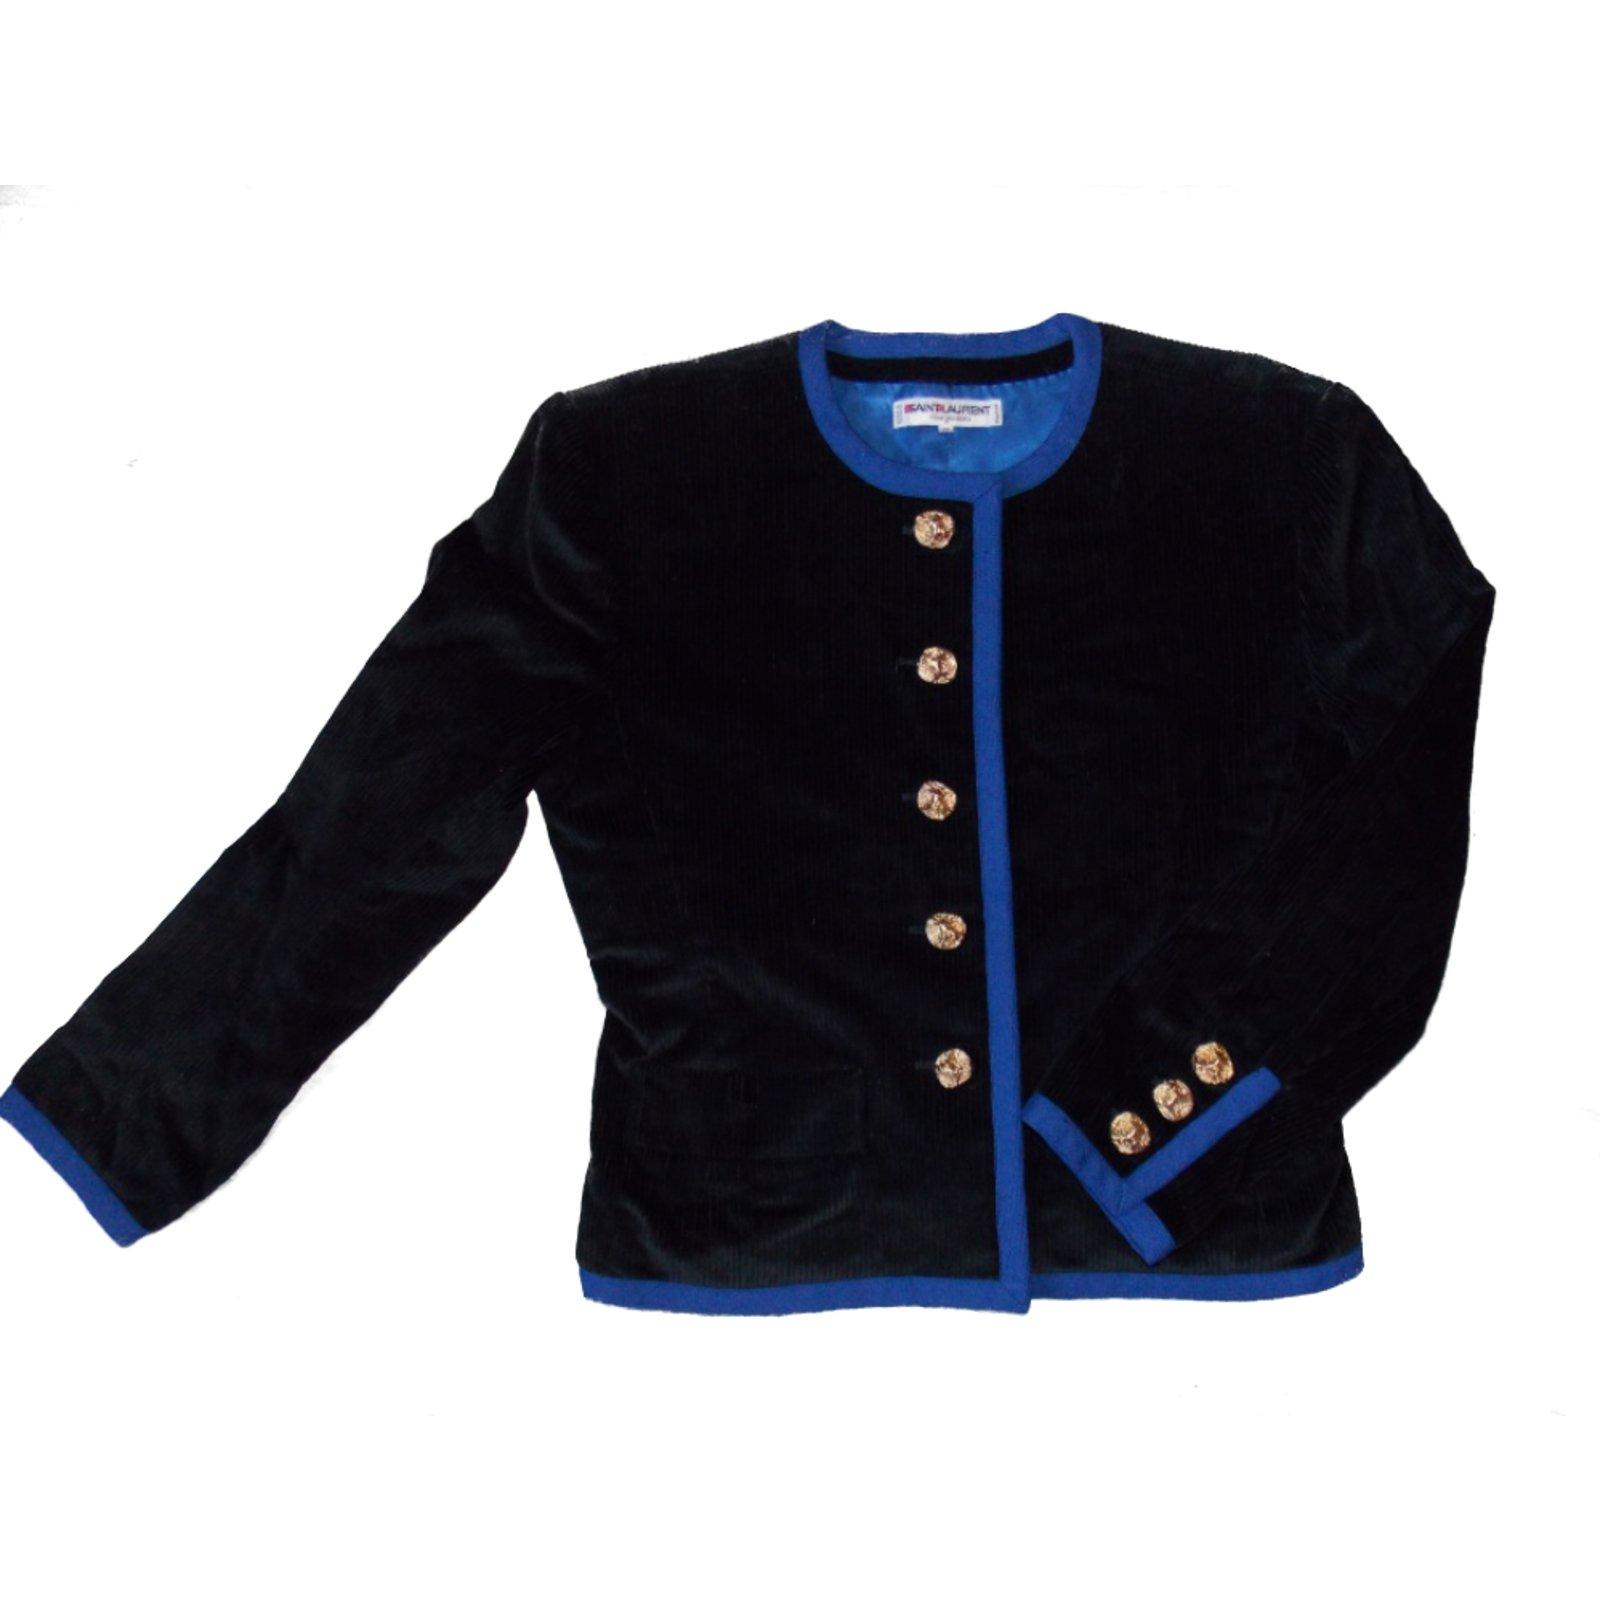 b36835e4bb0 Yves Saint Laurent Jackets Jackets Velvet Black ref.6510 - Joli Closet